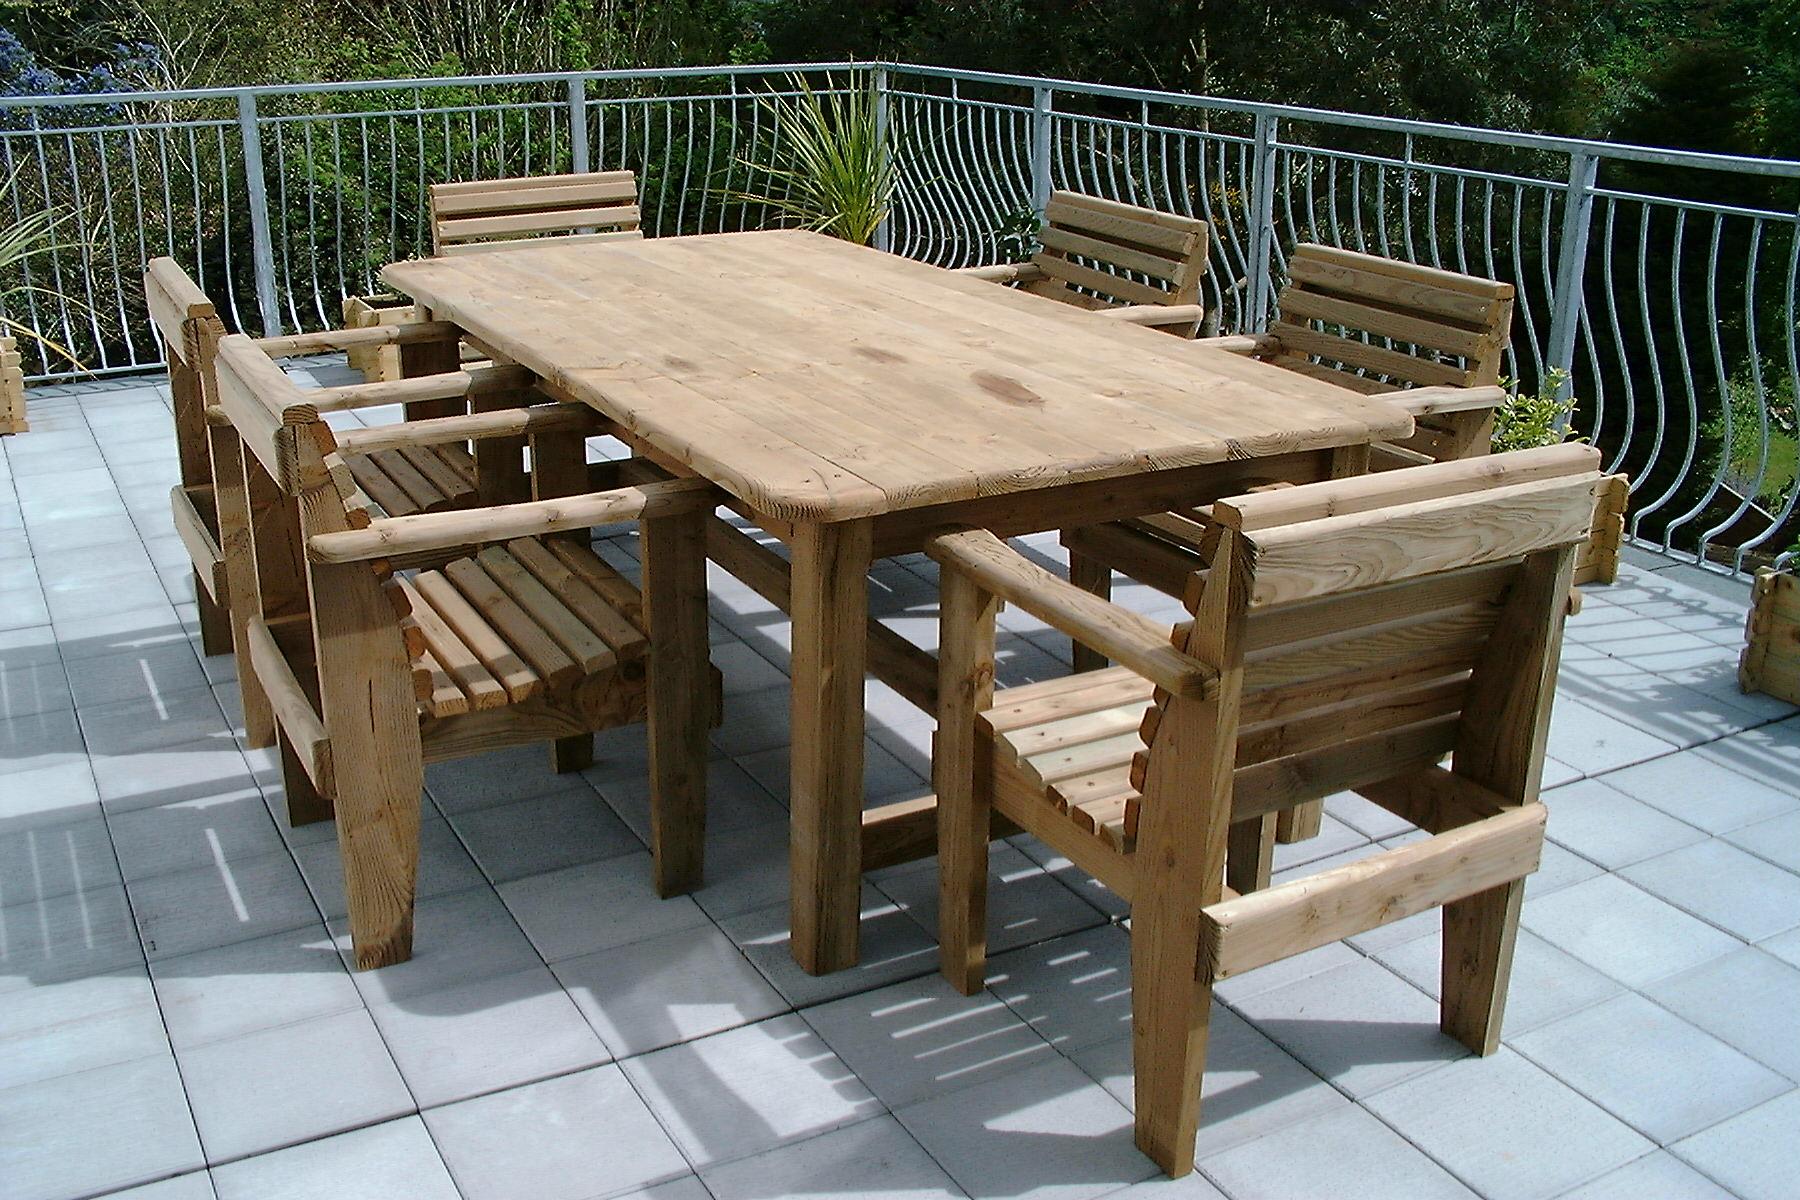 garden tables garden furniture table f5fee76 YDRDKUL